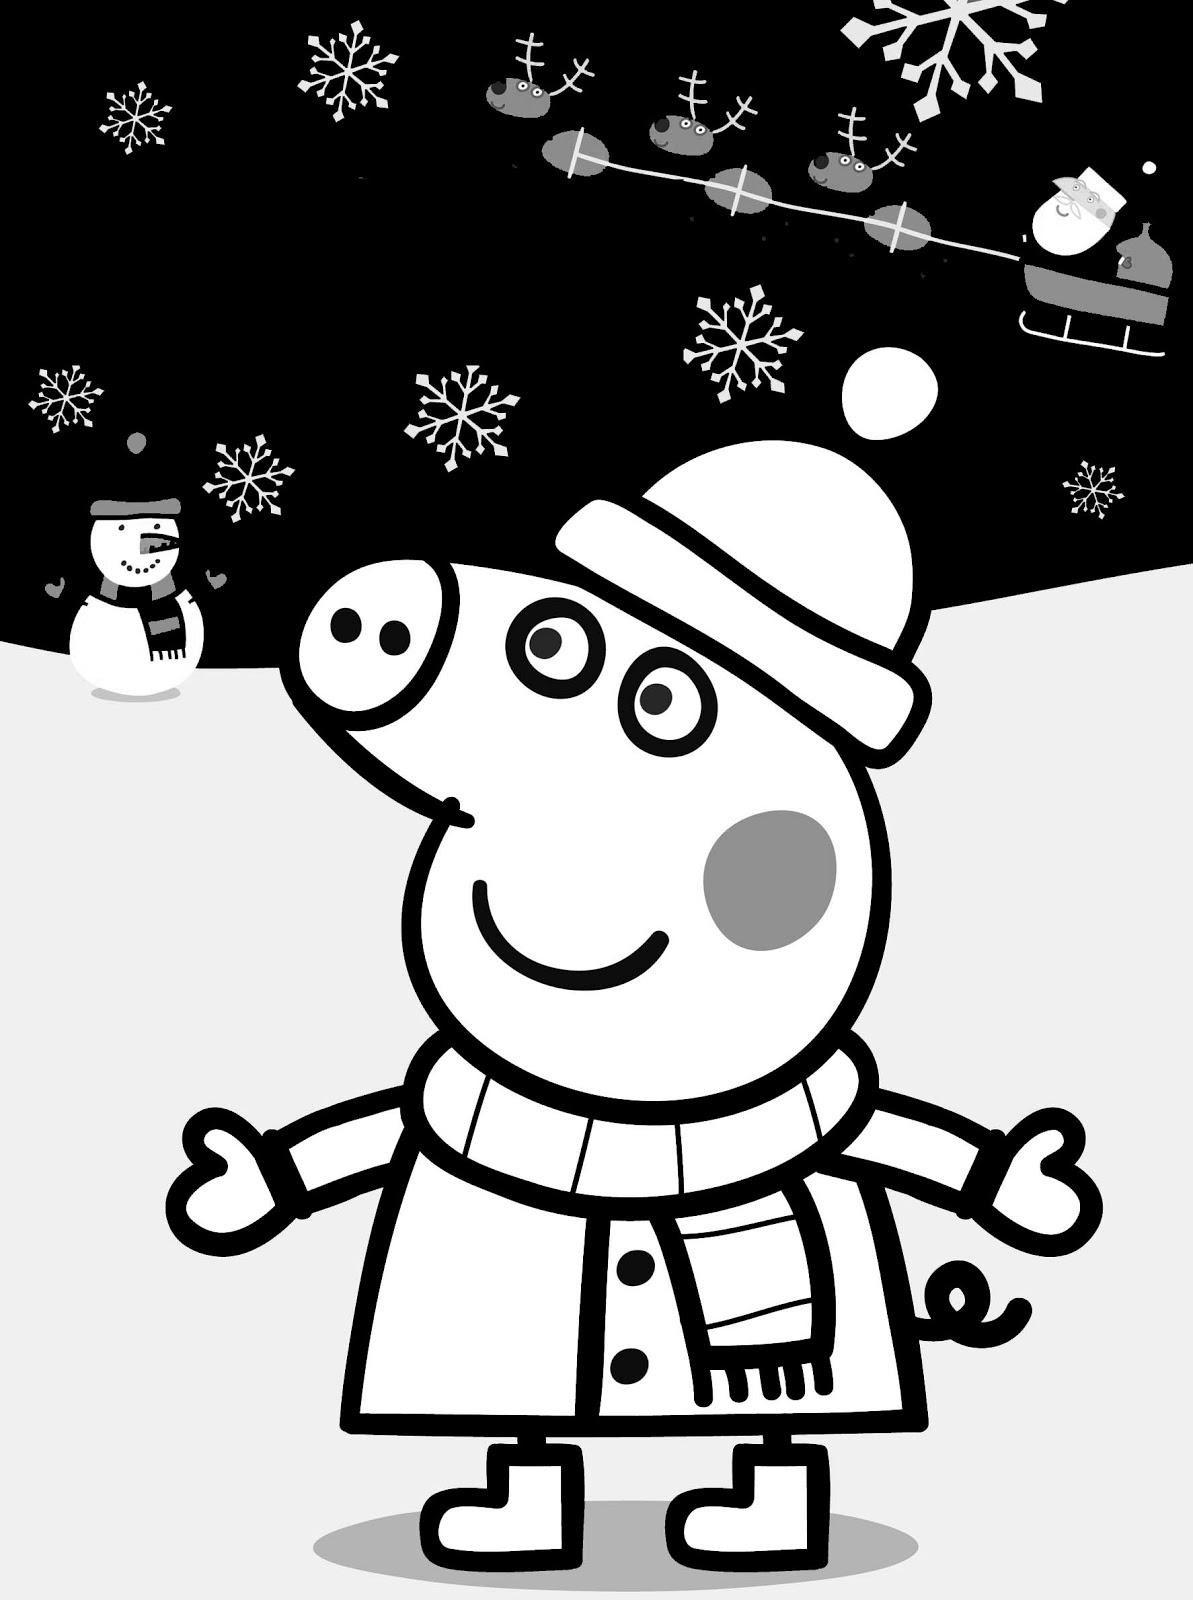 Peppa pig disegno da colorare n 3 for Maschere di peppa pig da colorare